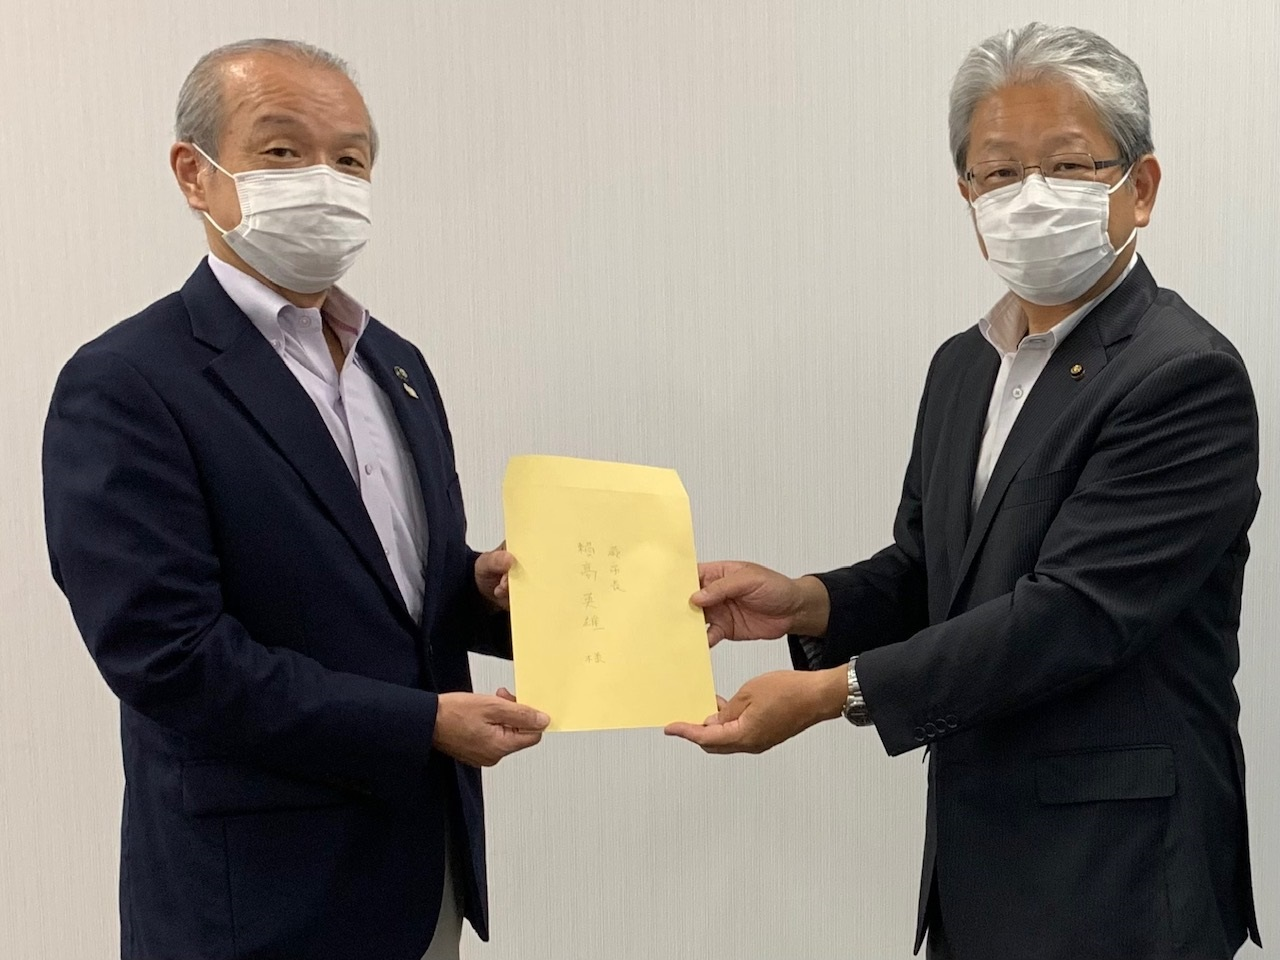 頼高英雄市長(左)に要望書を手渡す日本共産党蕨市議団(右:鈴木市議団長)